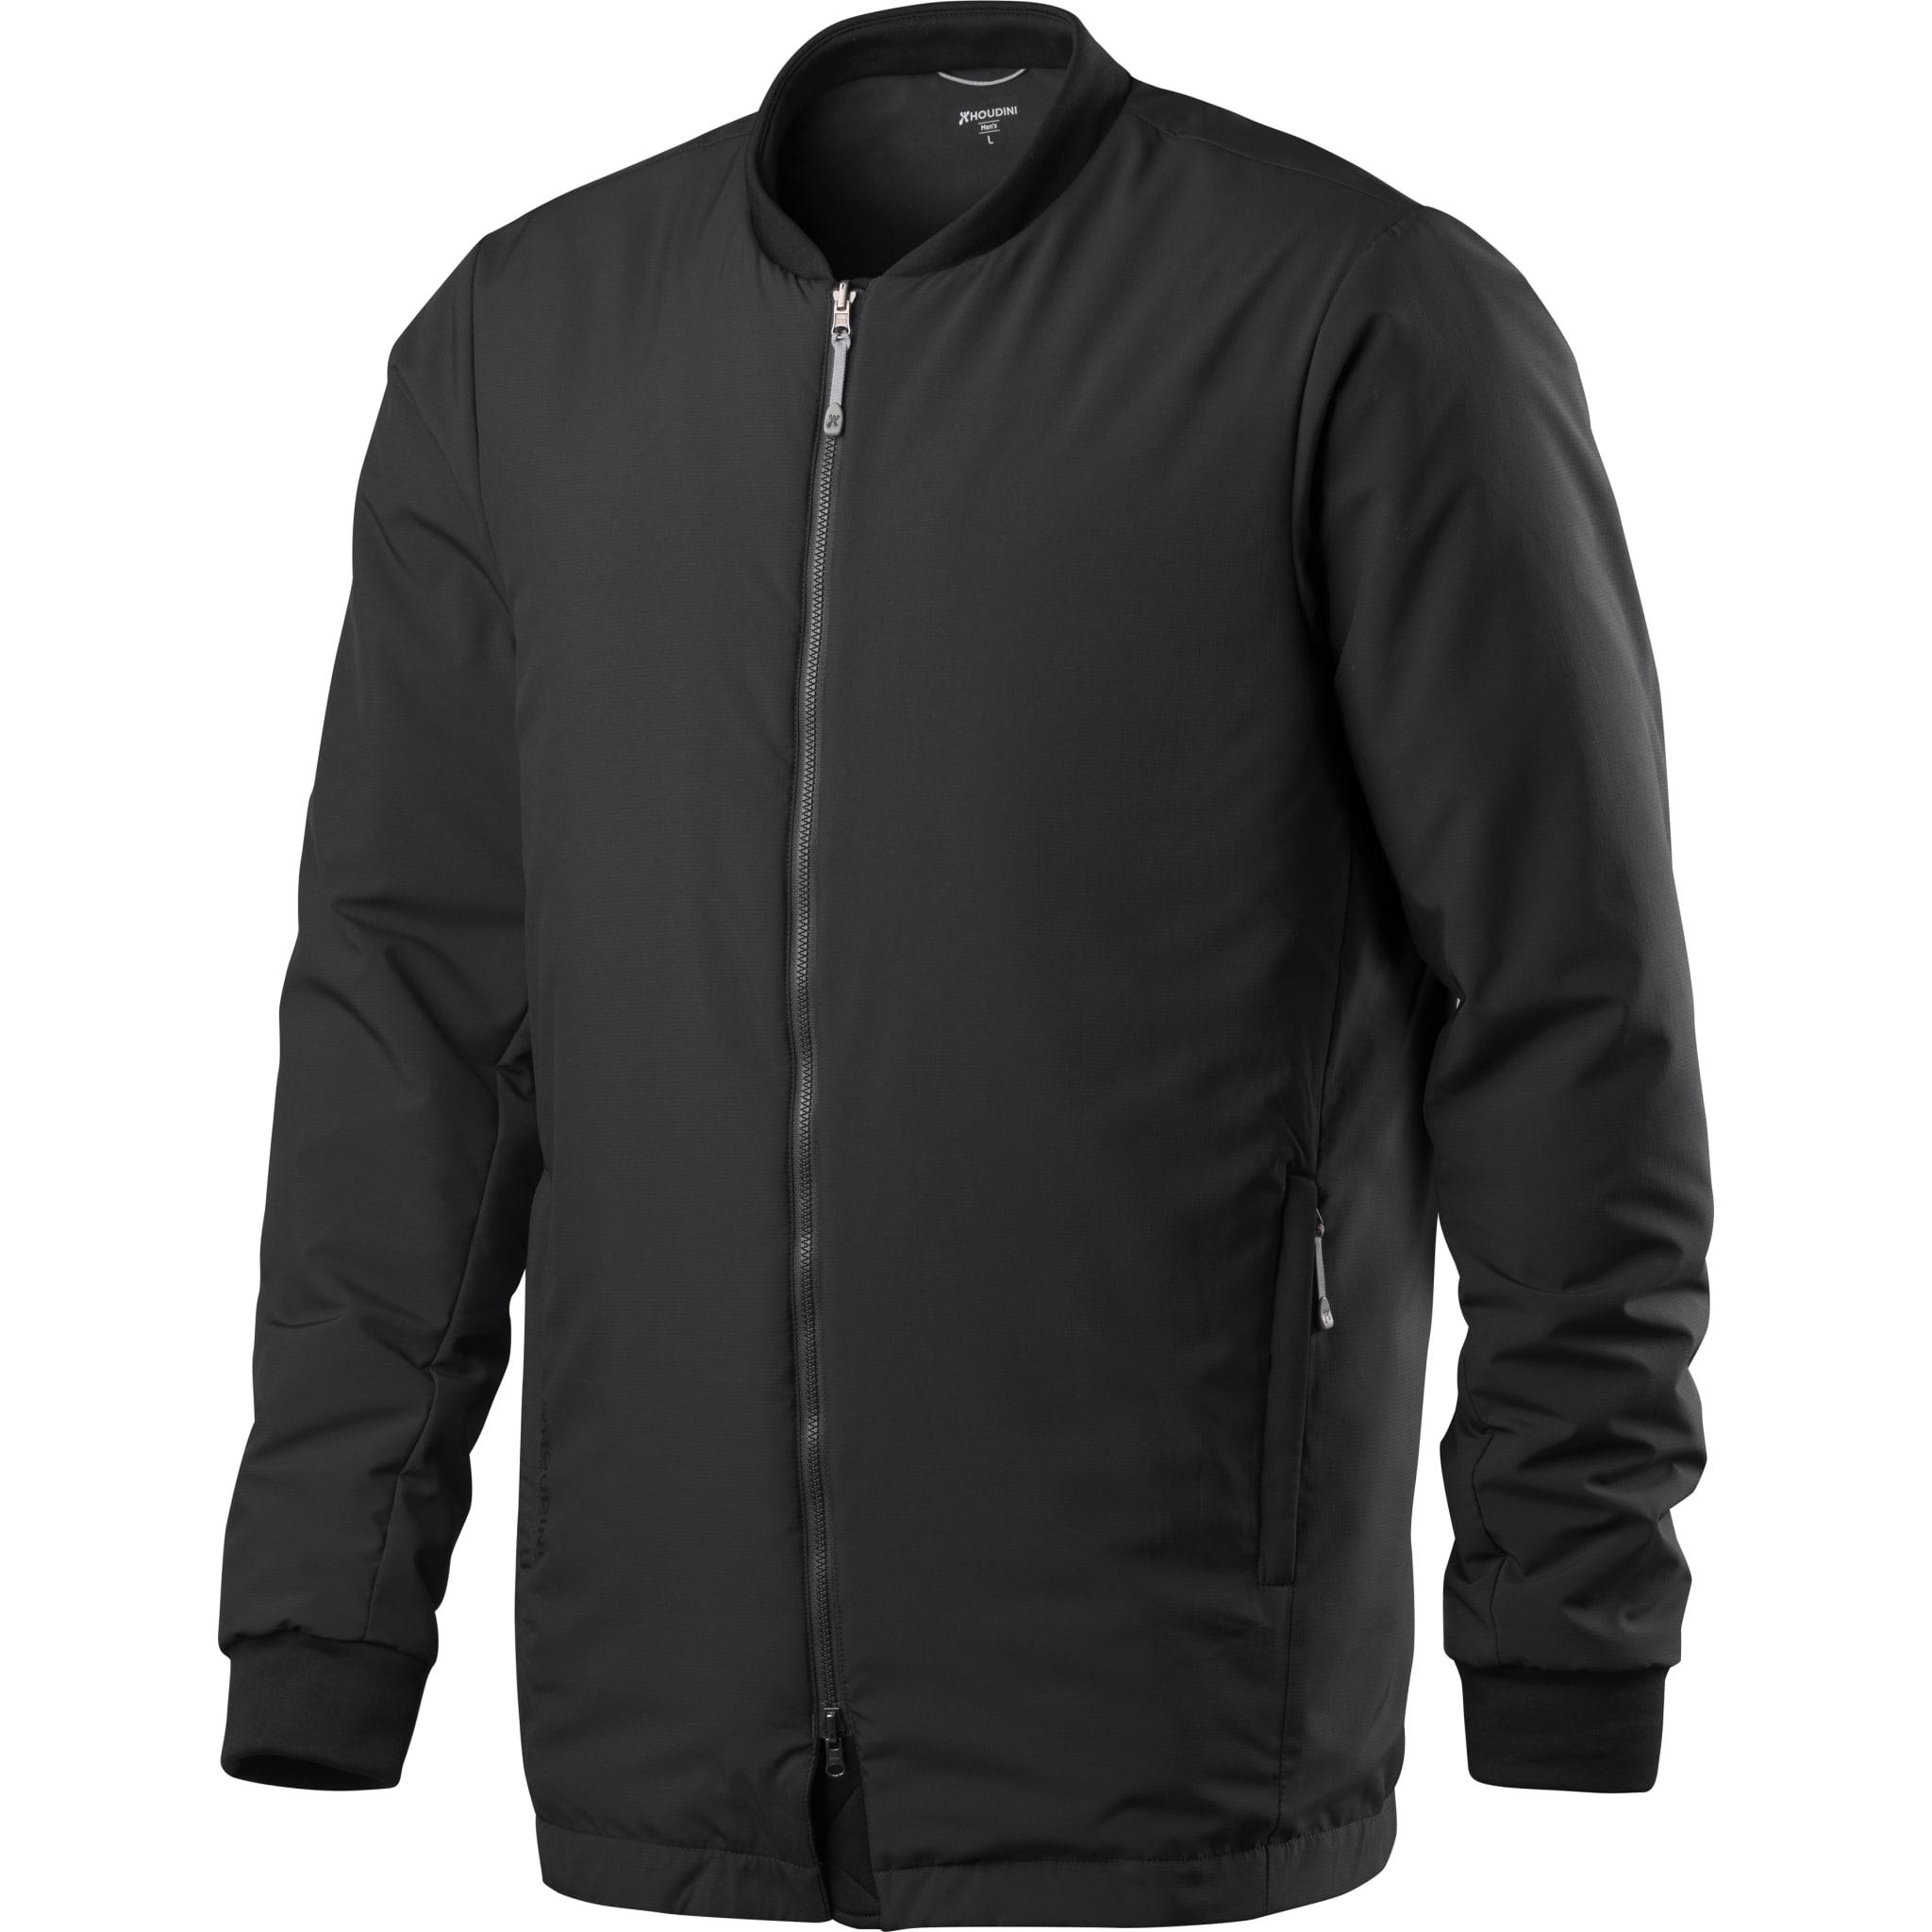 Pitch Jacket Ms